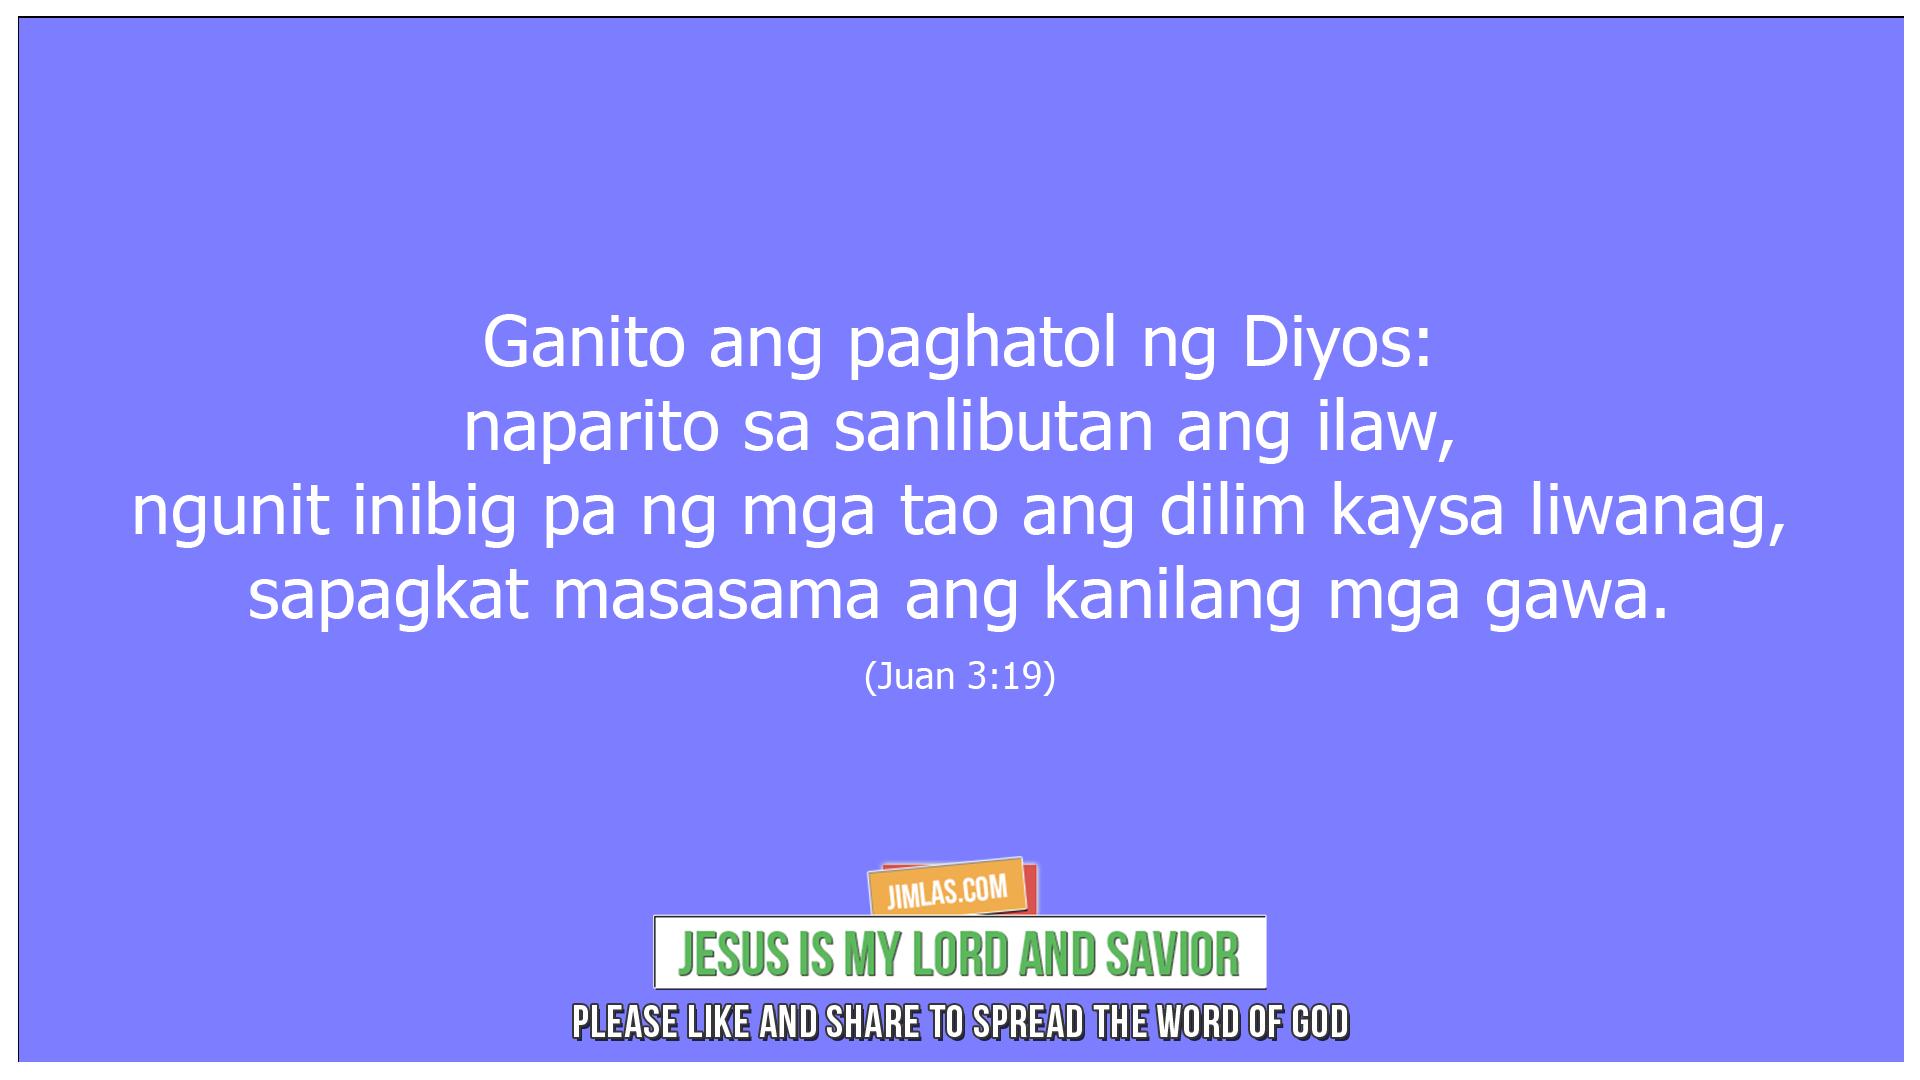 Juan 3 19, Juan 3:19